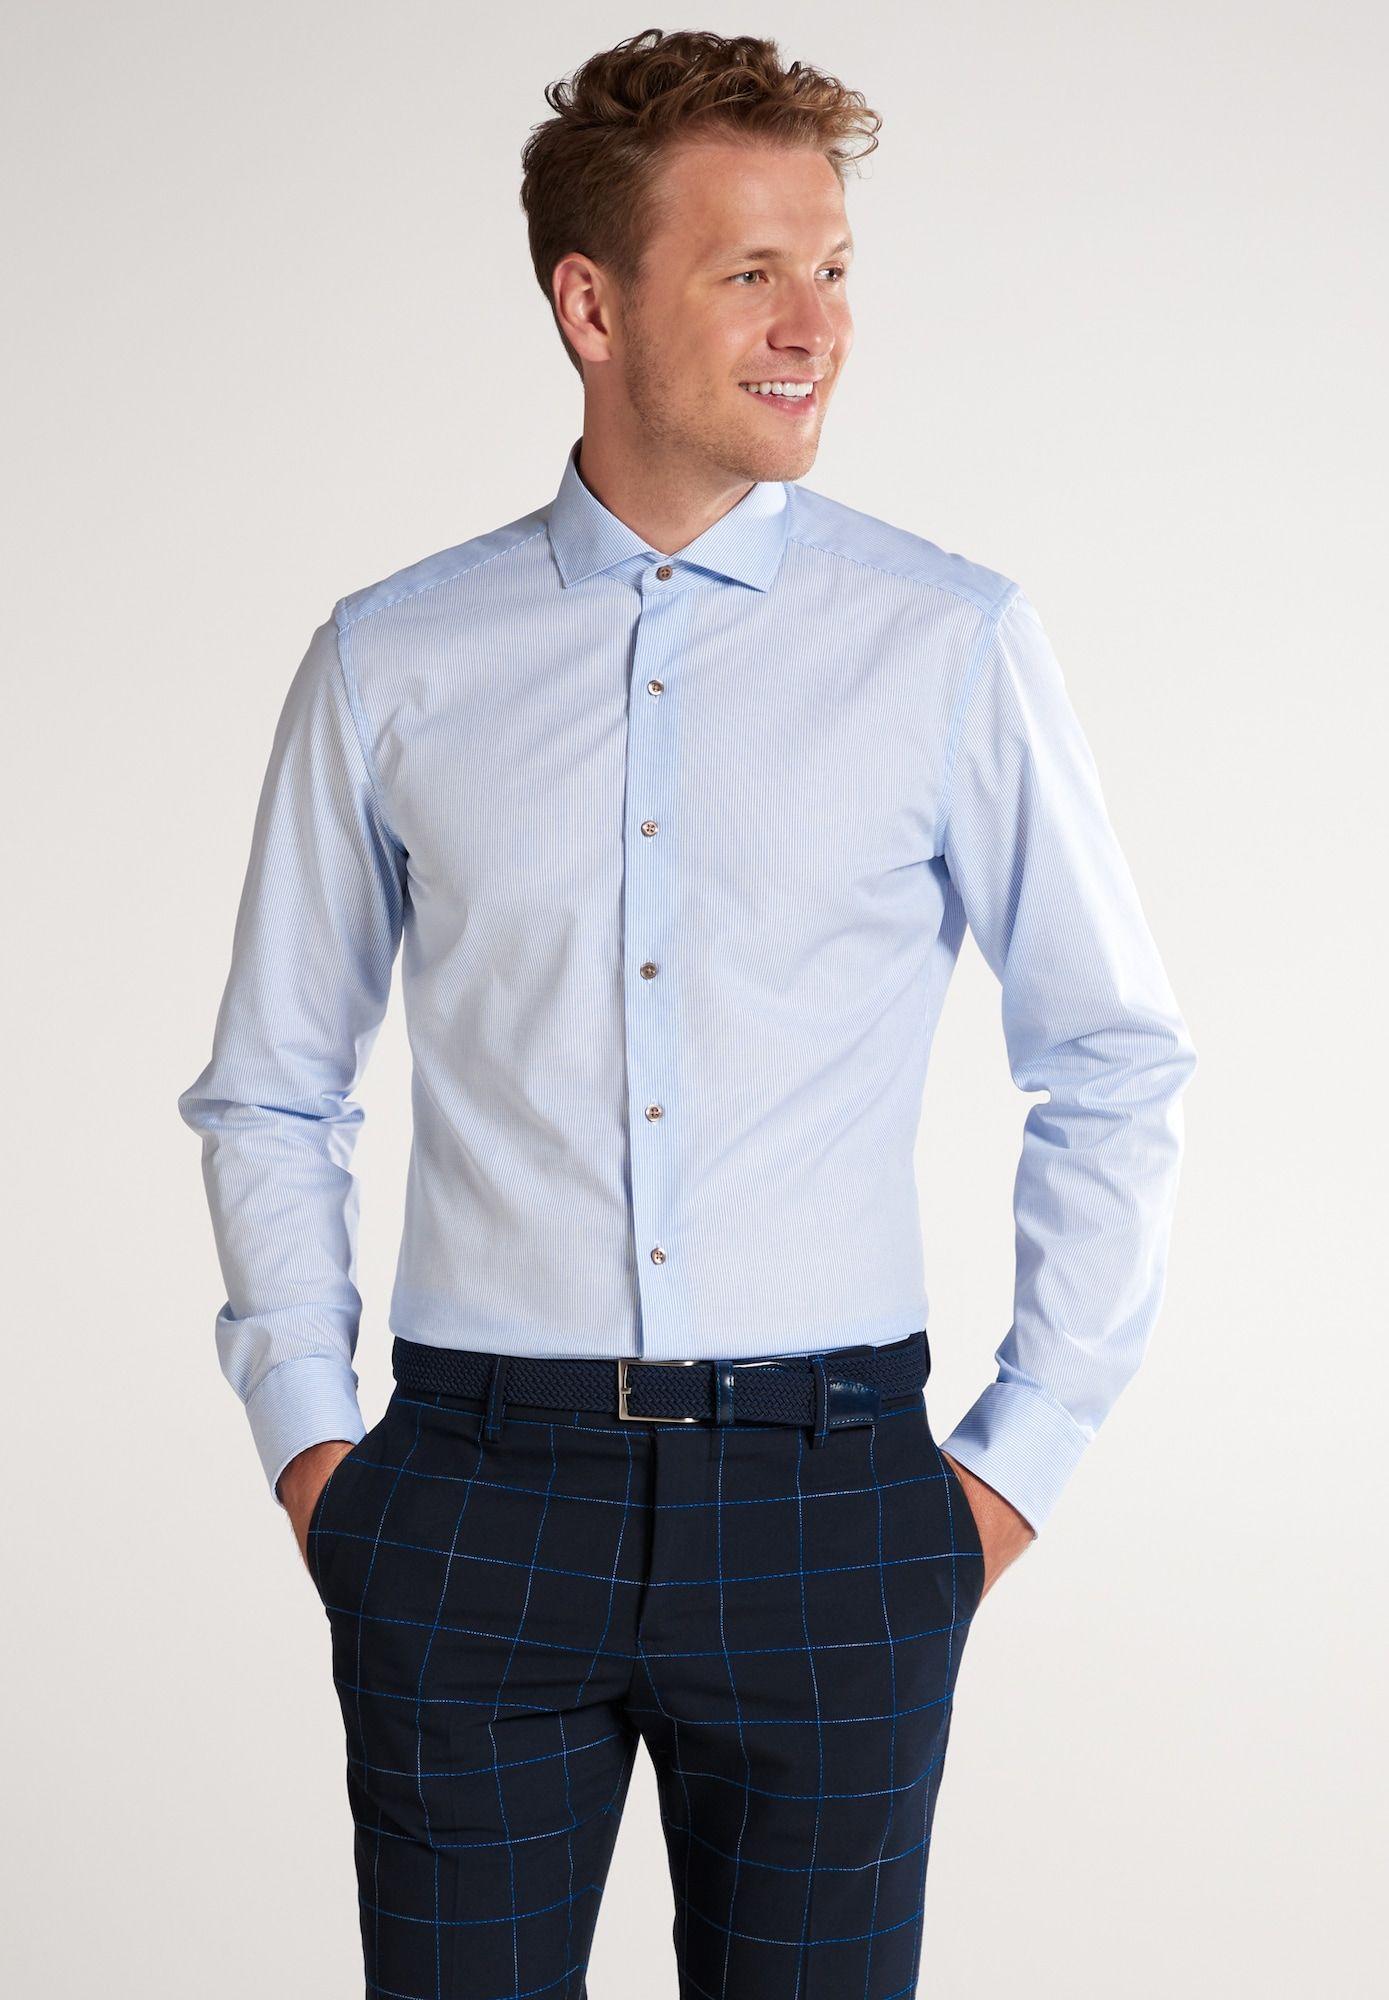 Eterna Hemd Herren Blau Grosse 44 Hemd Gestreifte Hemden Slim Fit